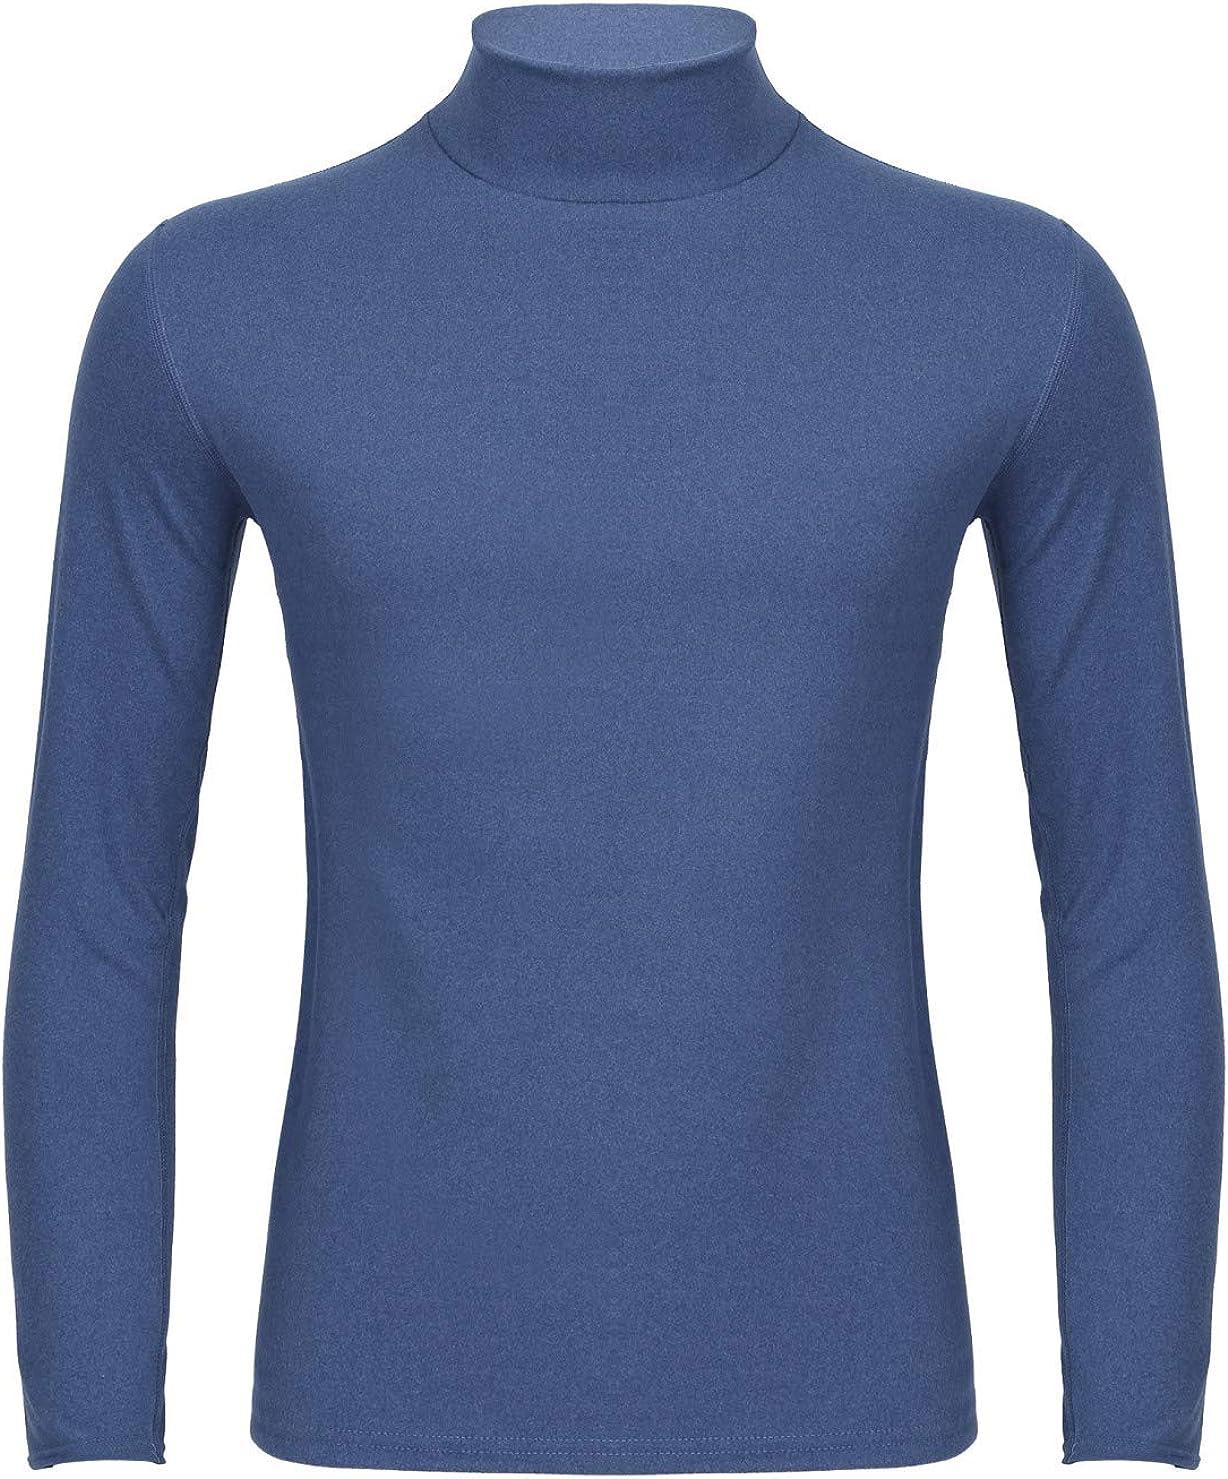 XUNZOO Mens Thermal Baselayer Turtleneck Long Sleeve Top Breathable Thermal Undershirt Underwear Tops